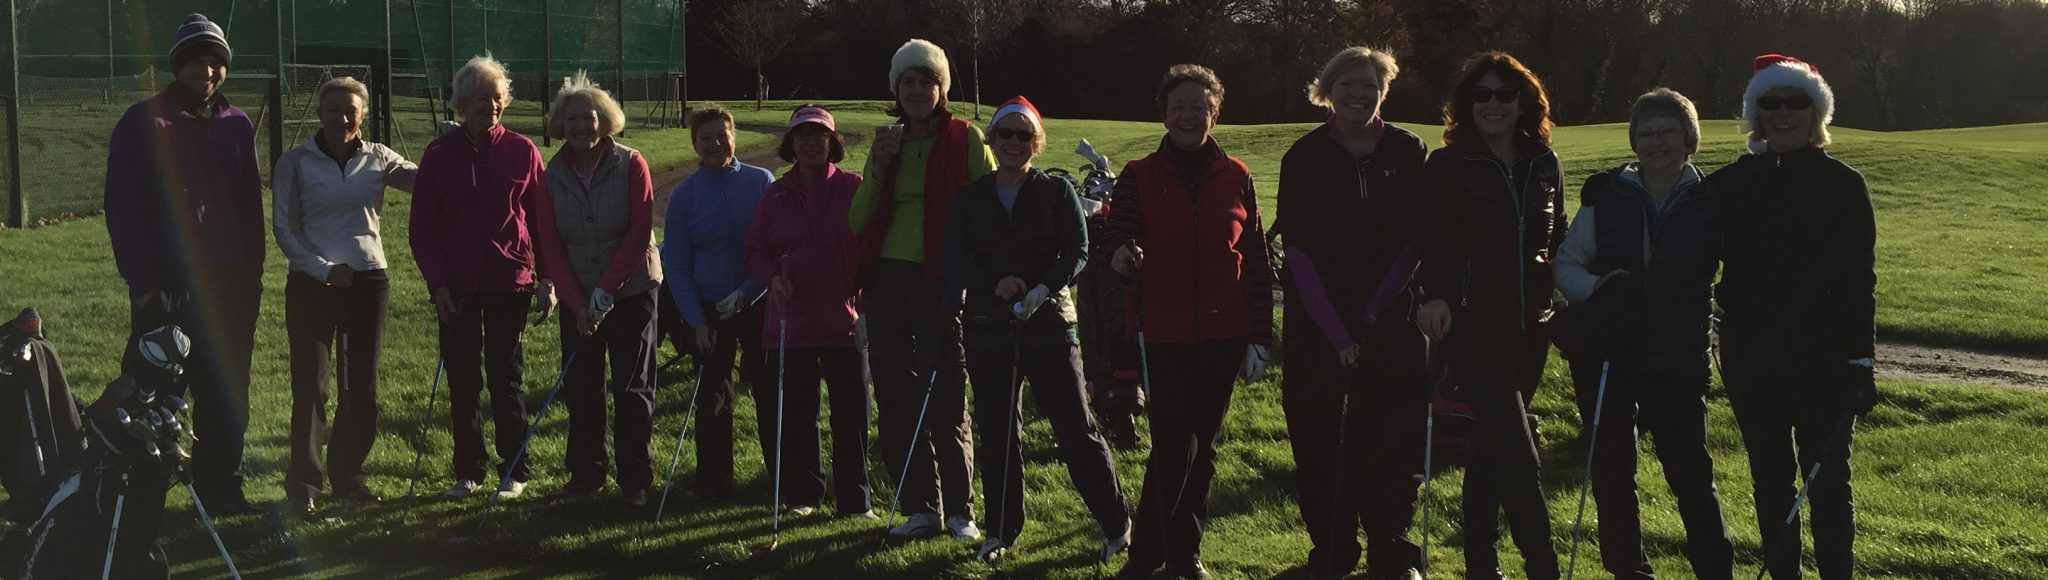 Ladies-of-Burgess-Hill-Golf-Centre